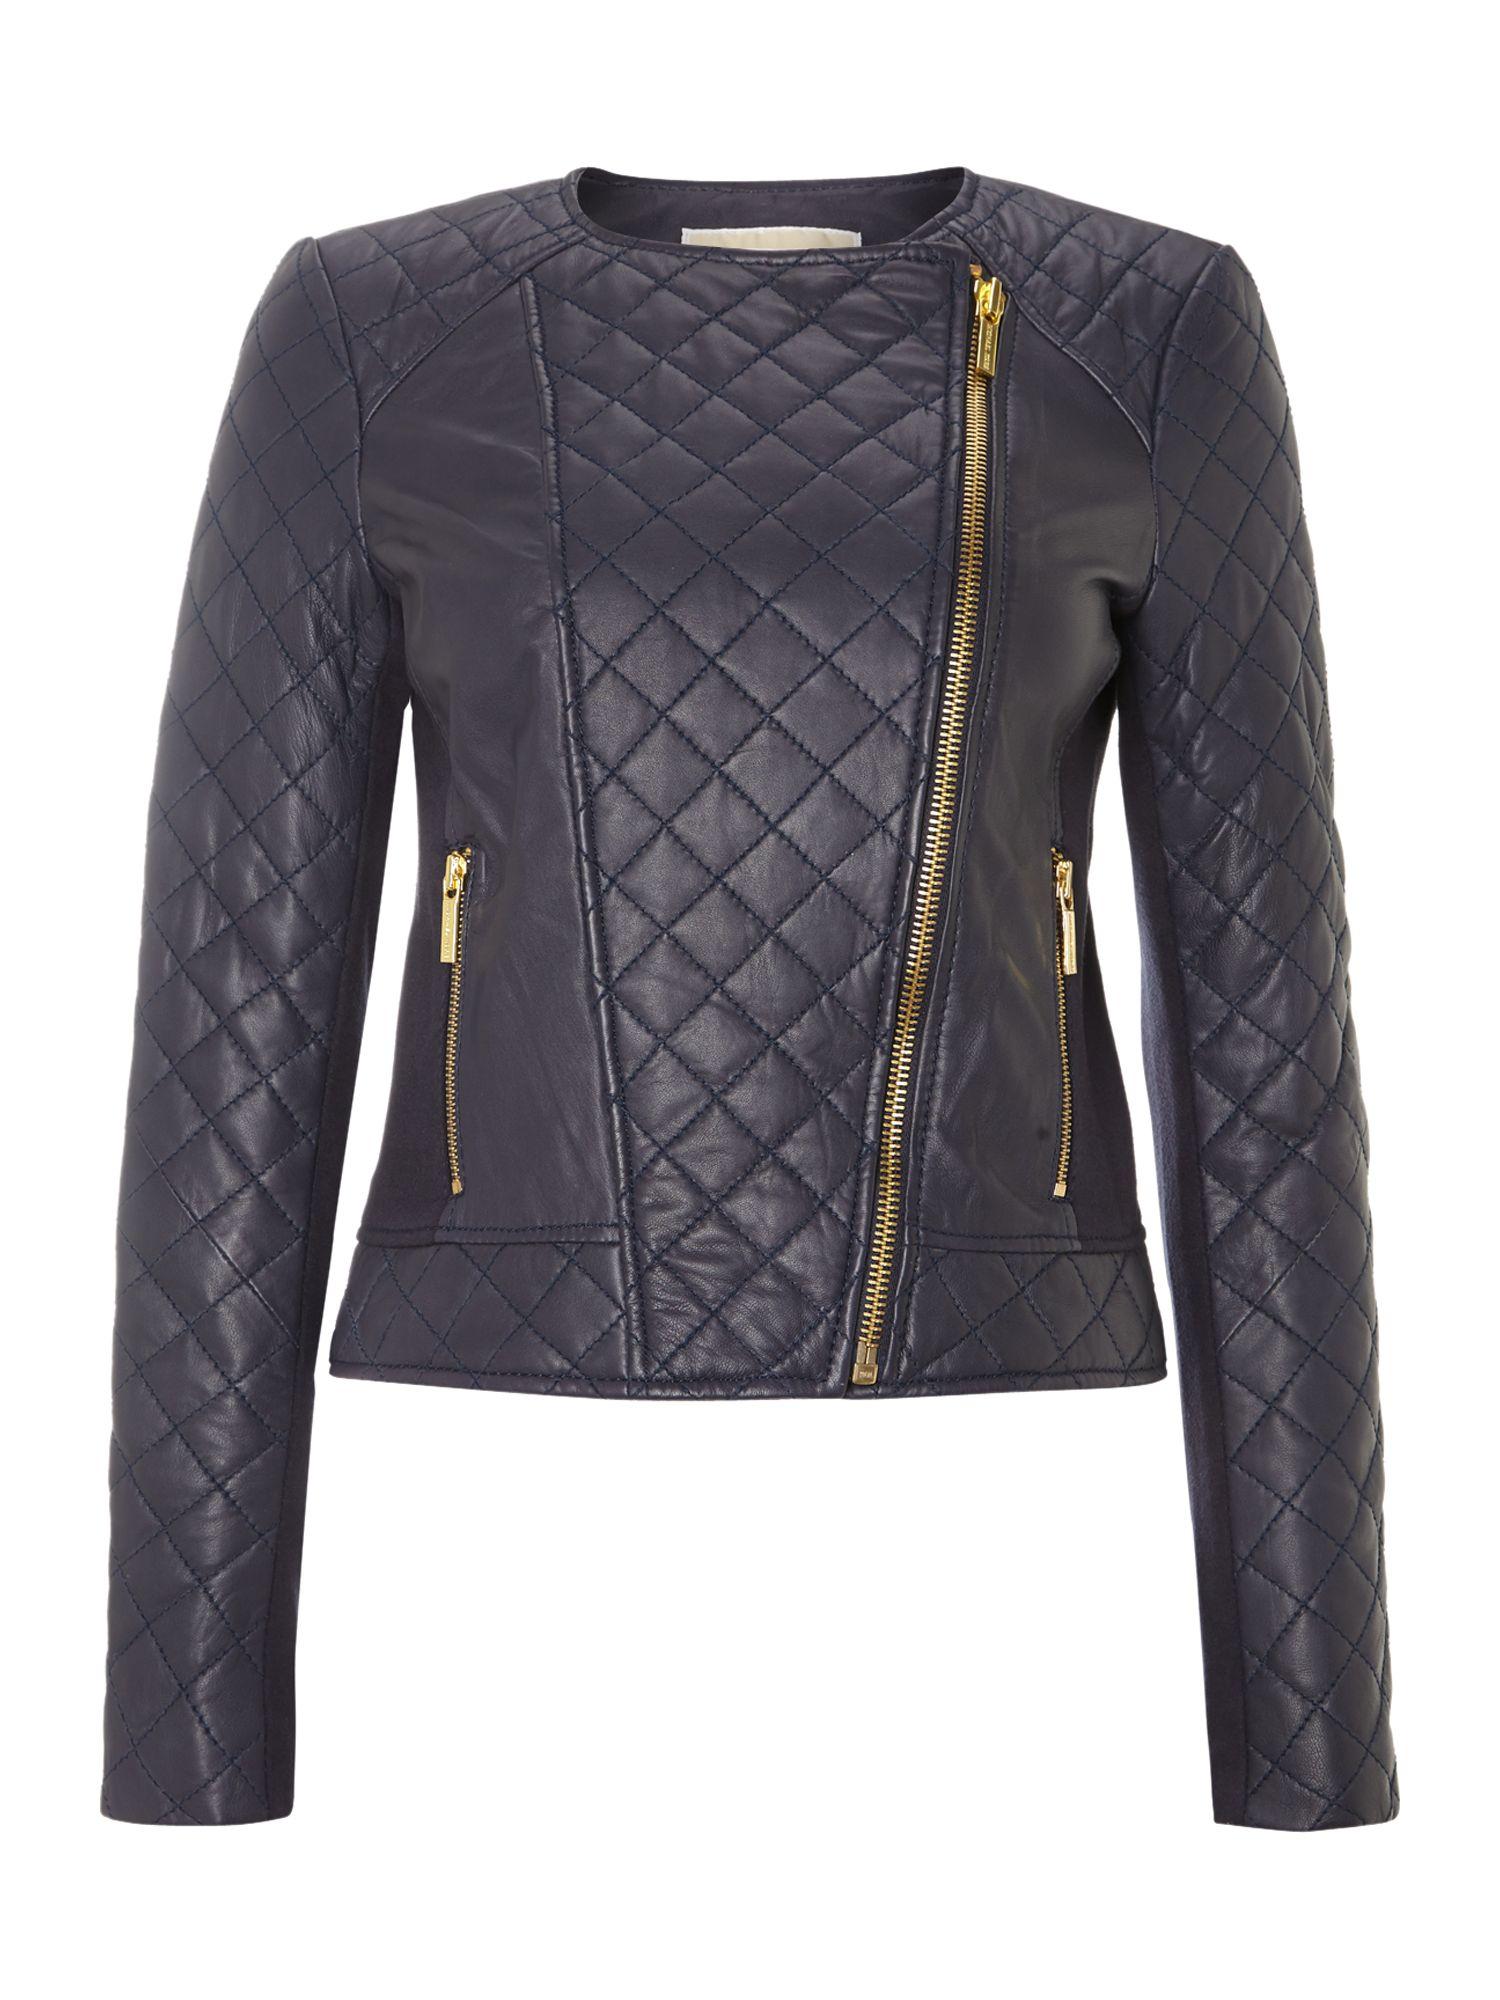 Michael kors blue leather jacket